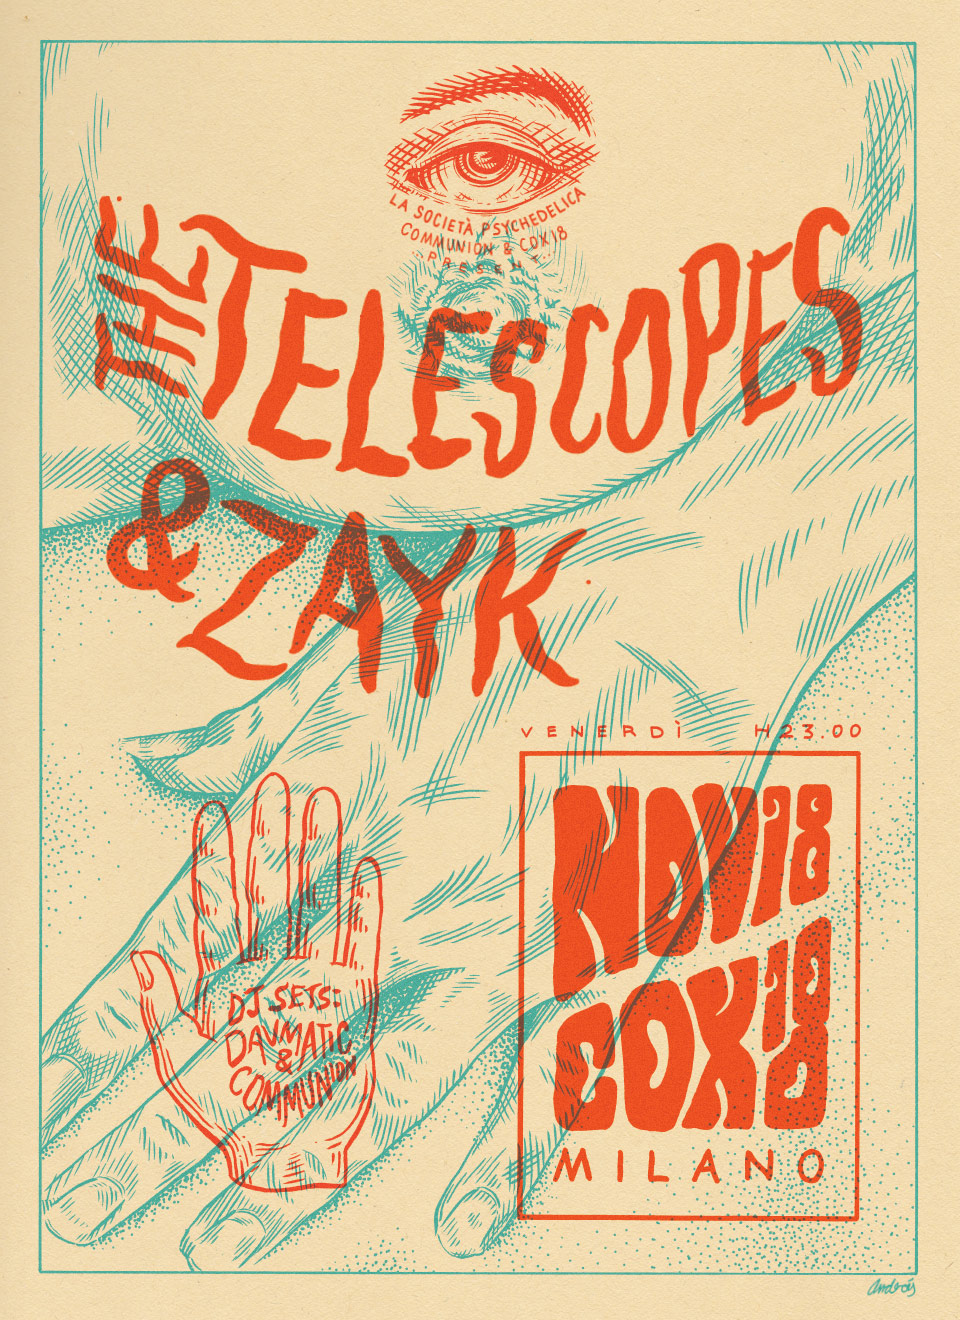 telescopes-cox18-poster